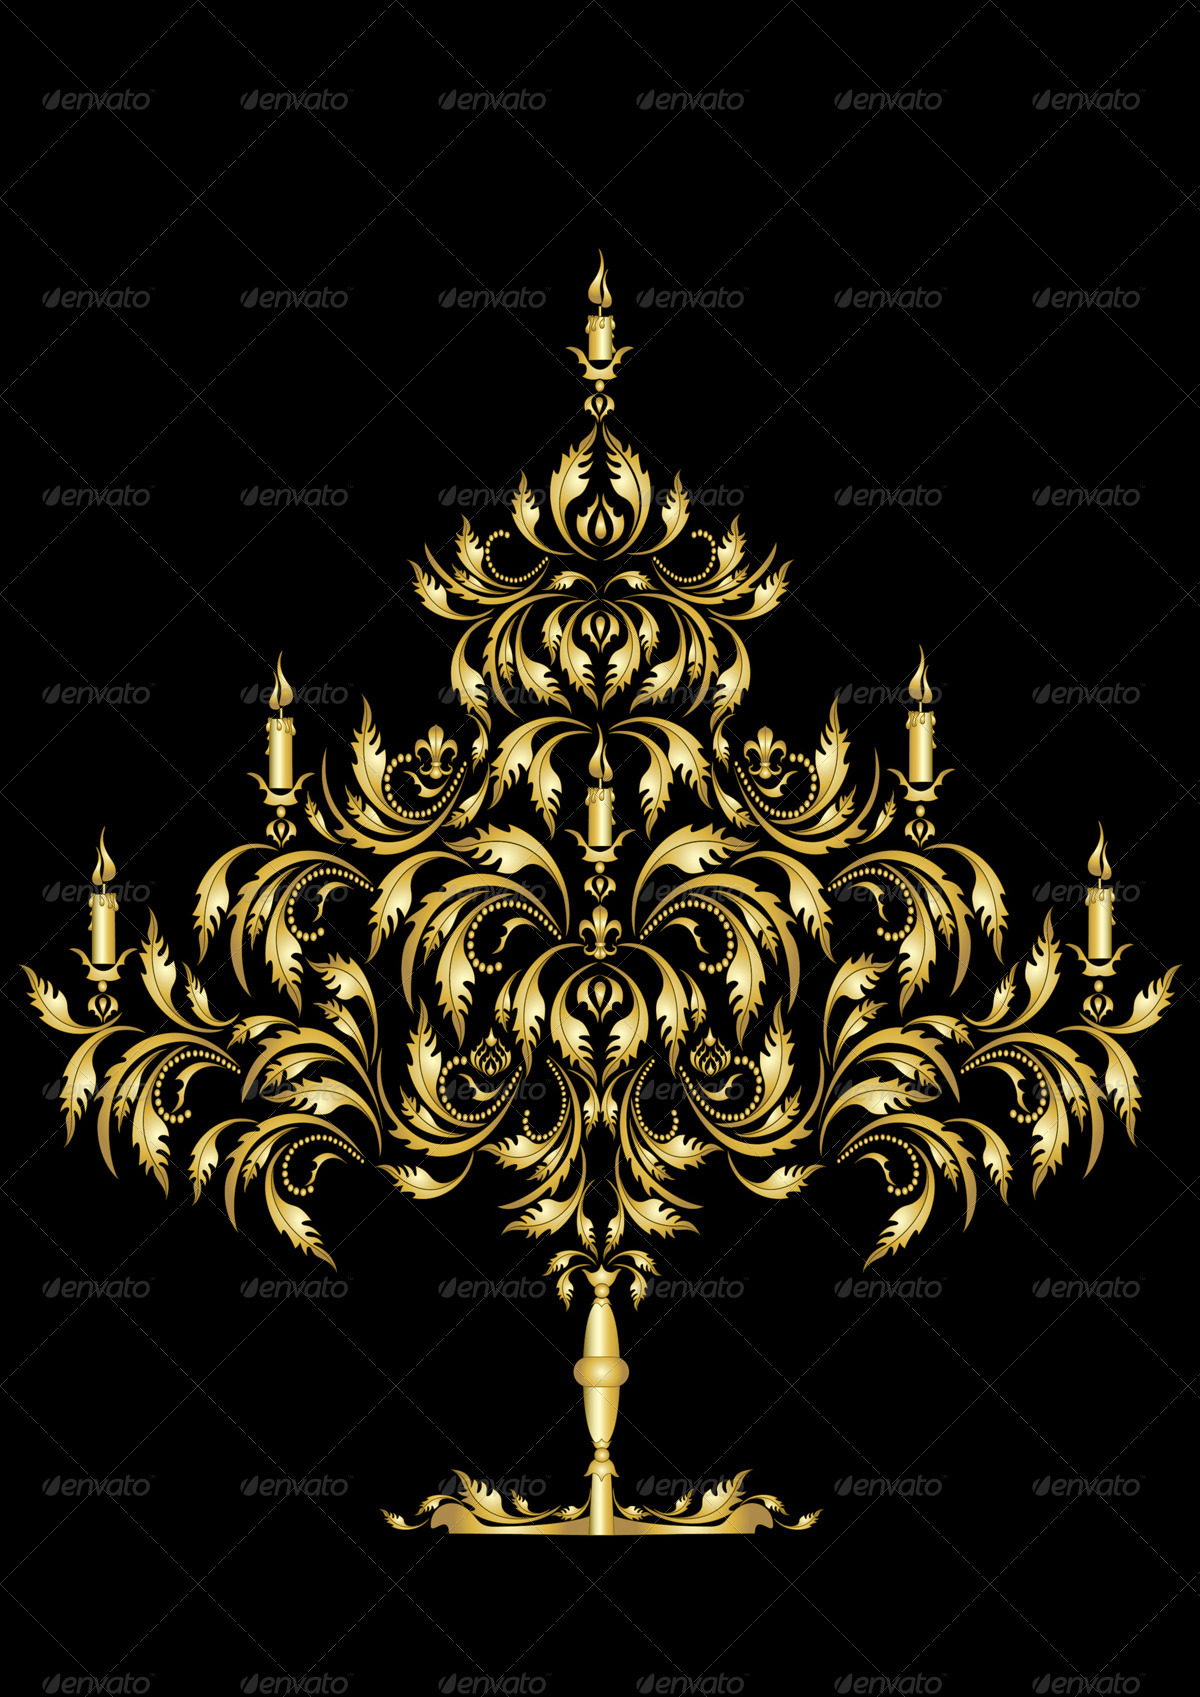 Gold Gothic Christmas Tree on Dark Background.